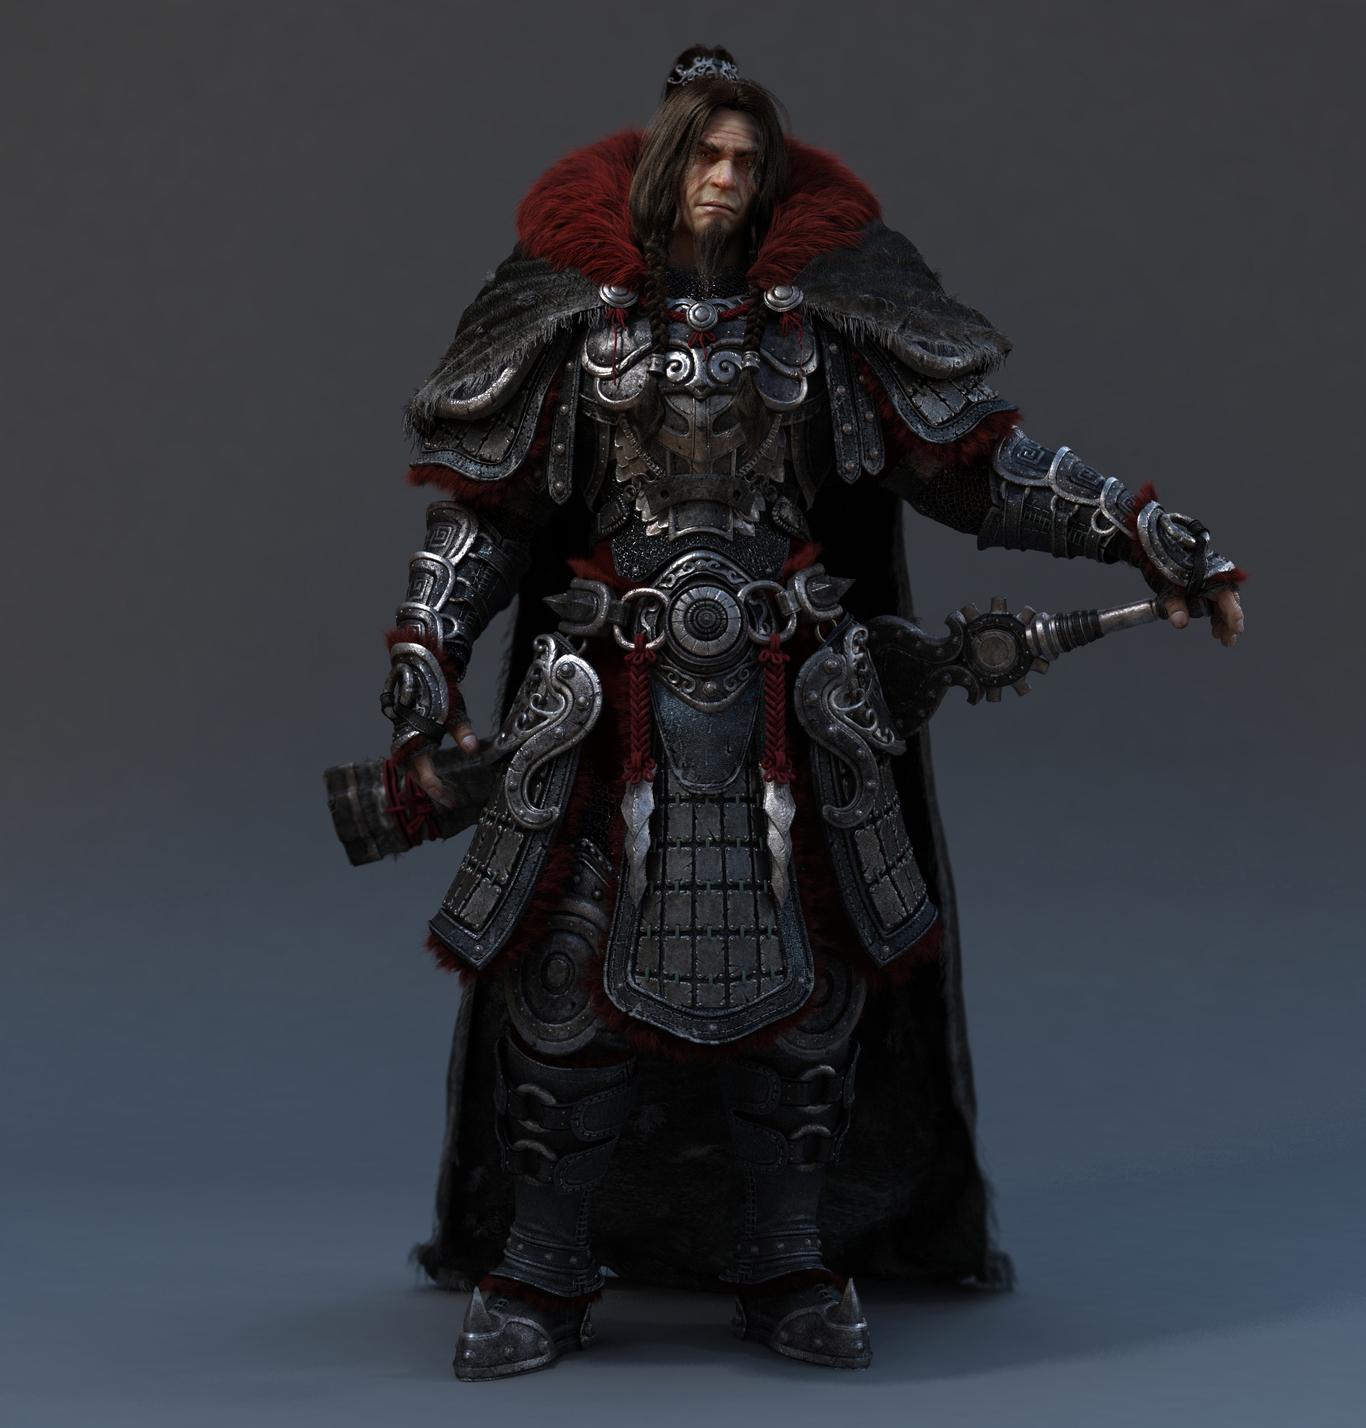 Huan gu gu cg ancient warrior 6 1 b1ec1173 726q